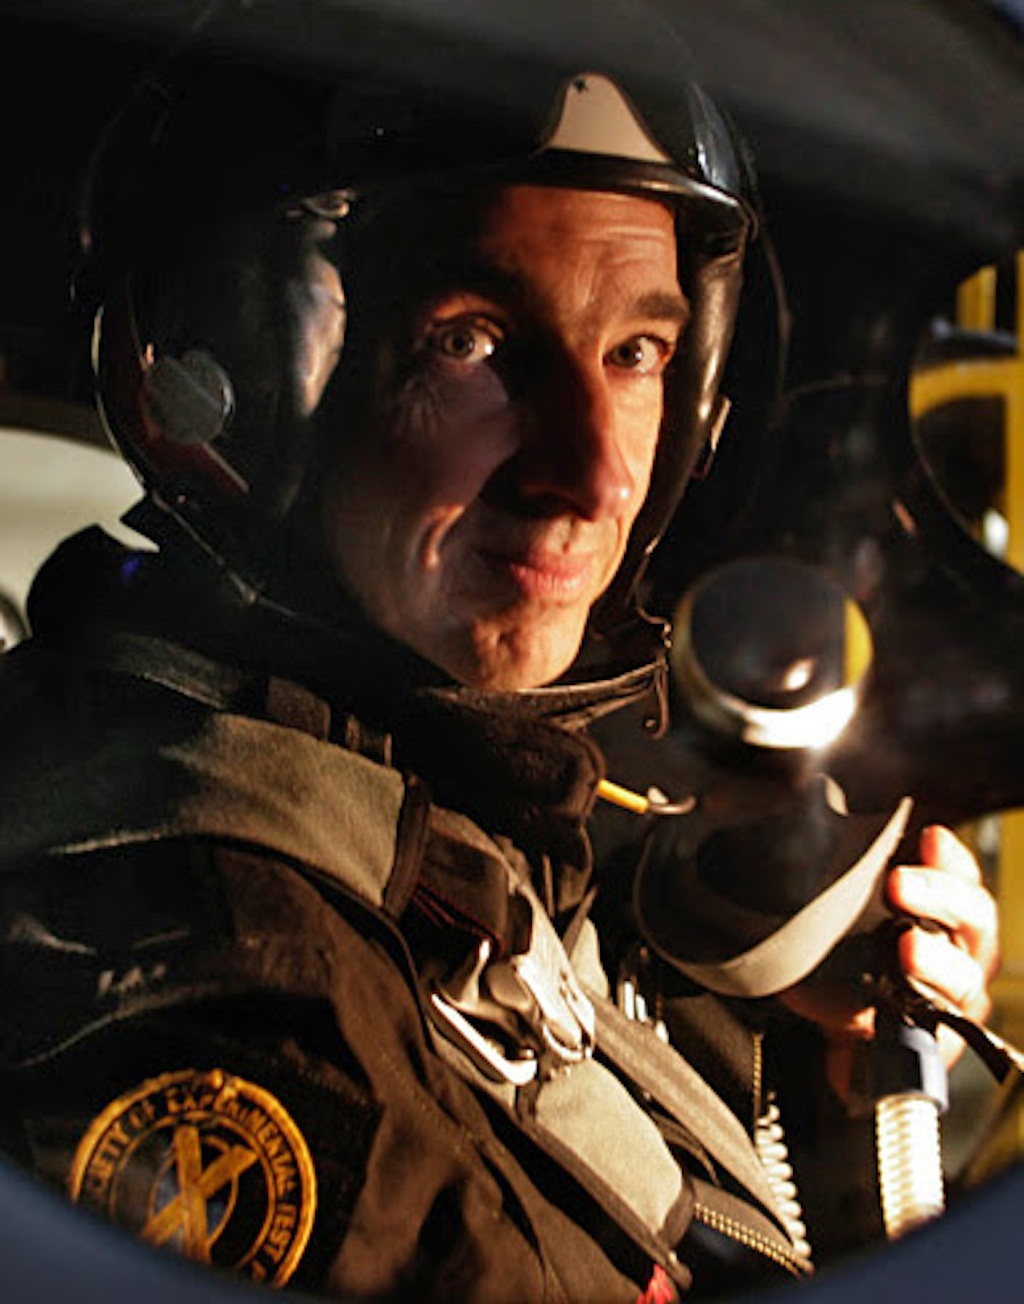 XCOR Aerospace Hires Private Spaceflight Pioneer Brian Binnie as Senior Test Pilot